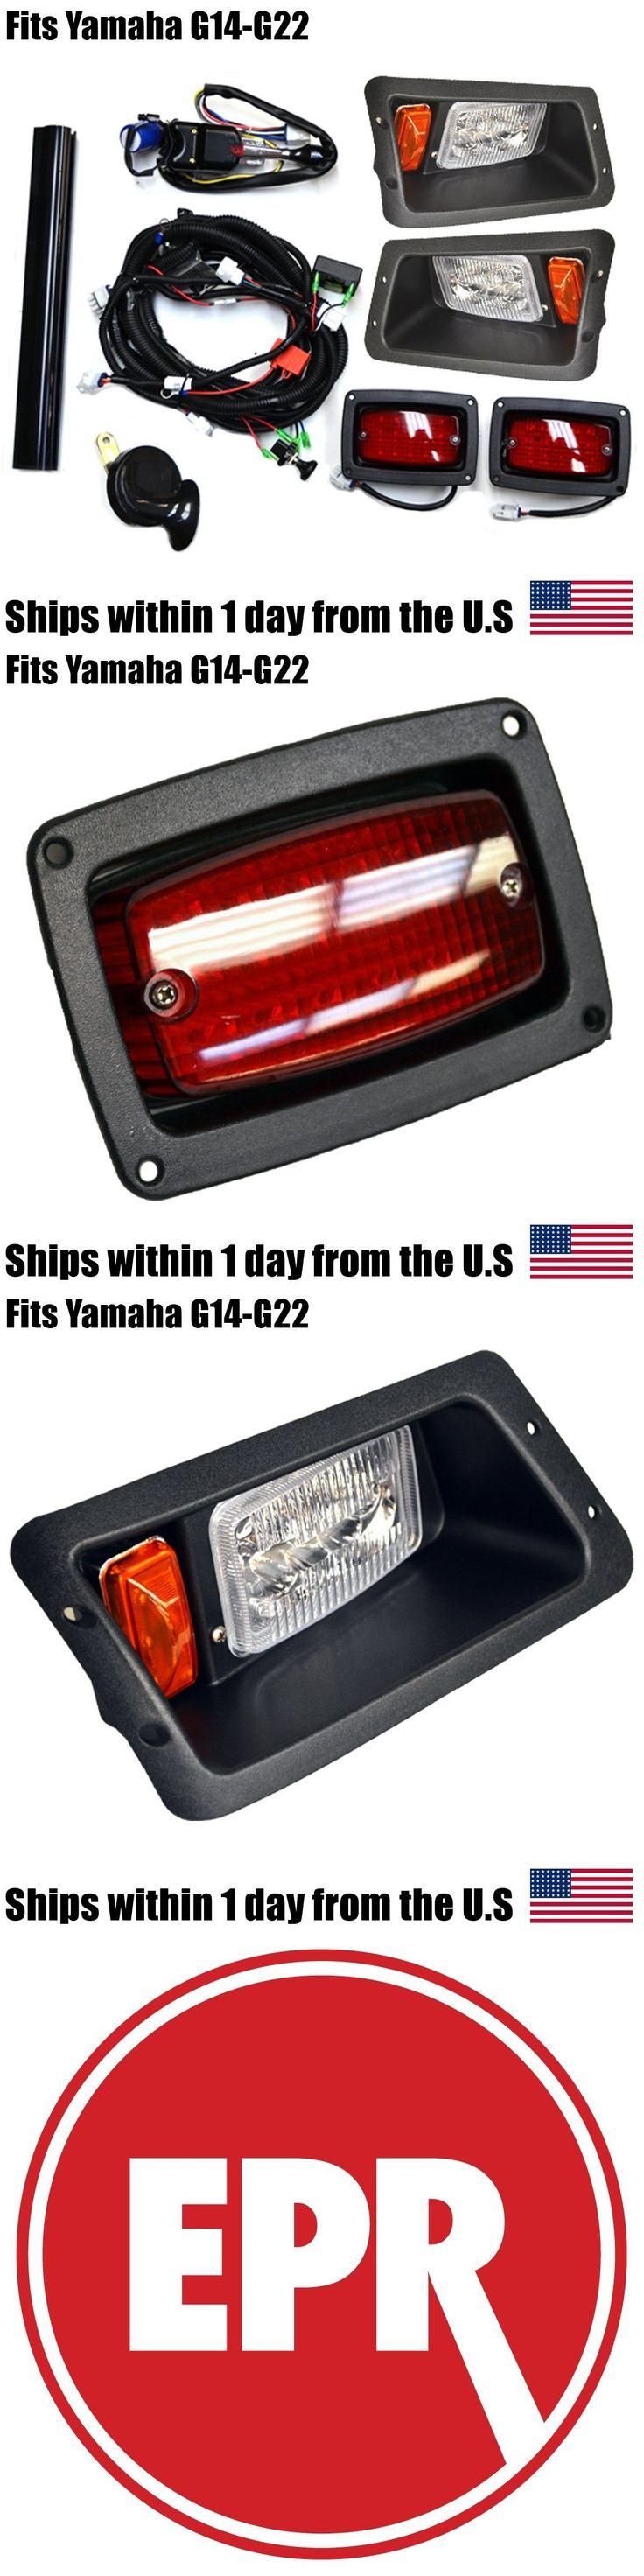 Push-Pull Golf Cart Parts 181154: Yamaha G14 G16 G19 G22 Golf Cart Street Legal All Led Headlight Tail Light Kit BUY IT NOW ONLY: $112.26